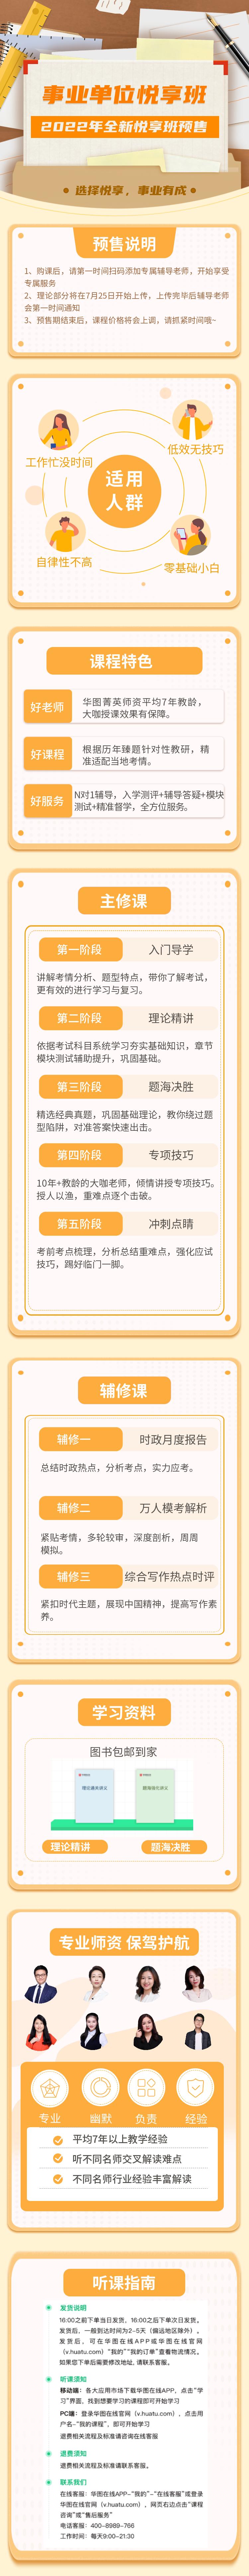 http://upload.htexam.com/userimg/1625909523.png